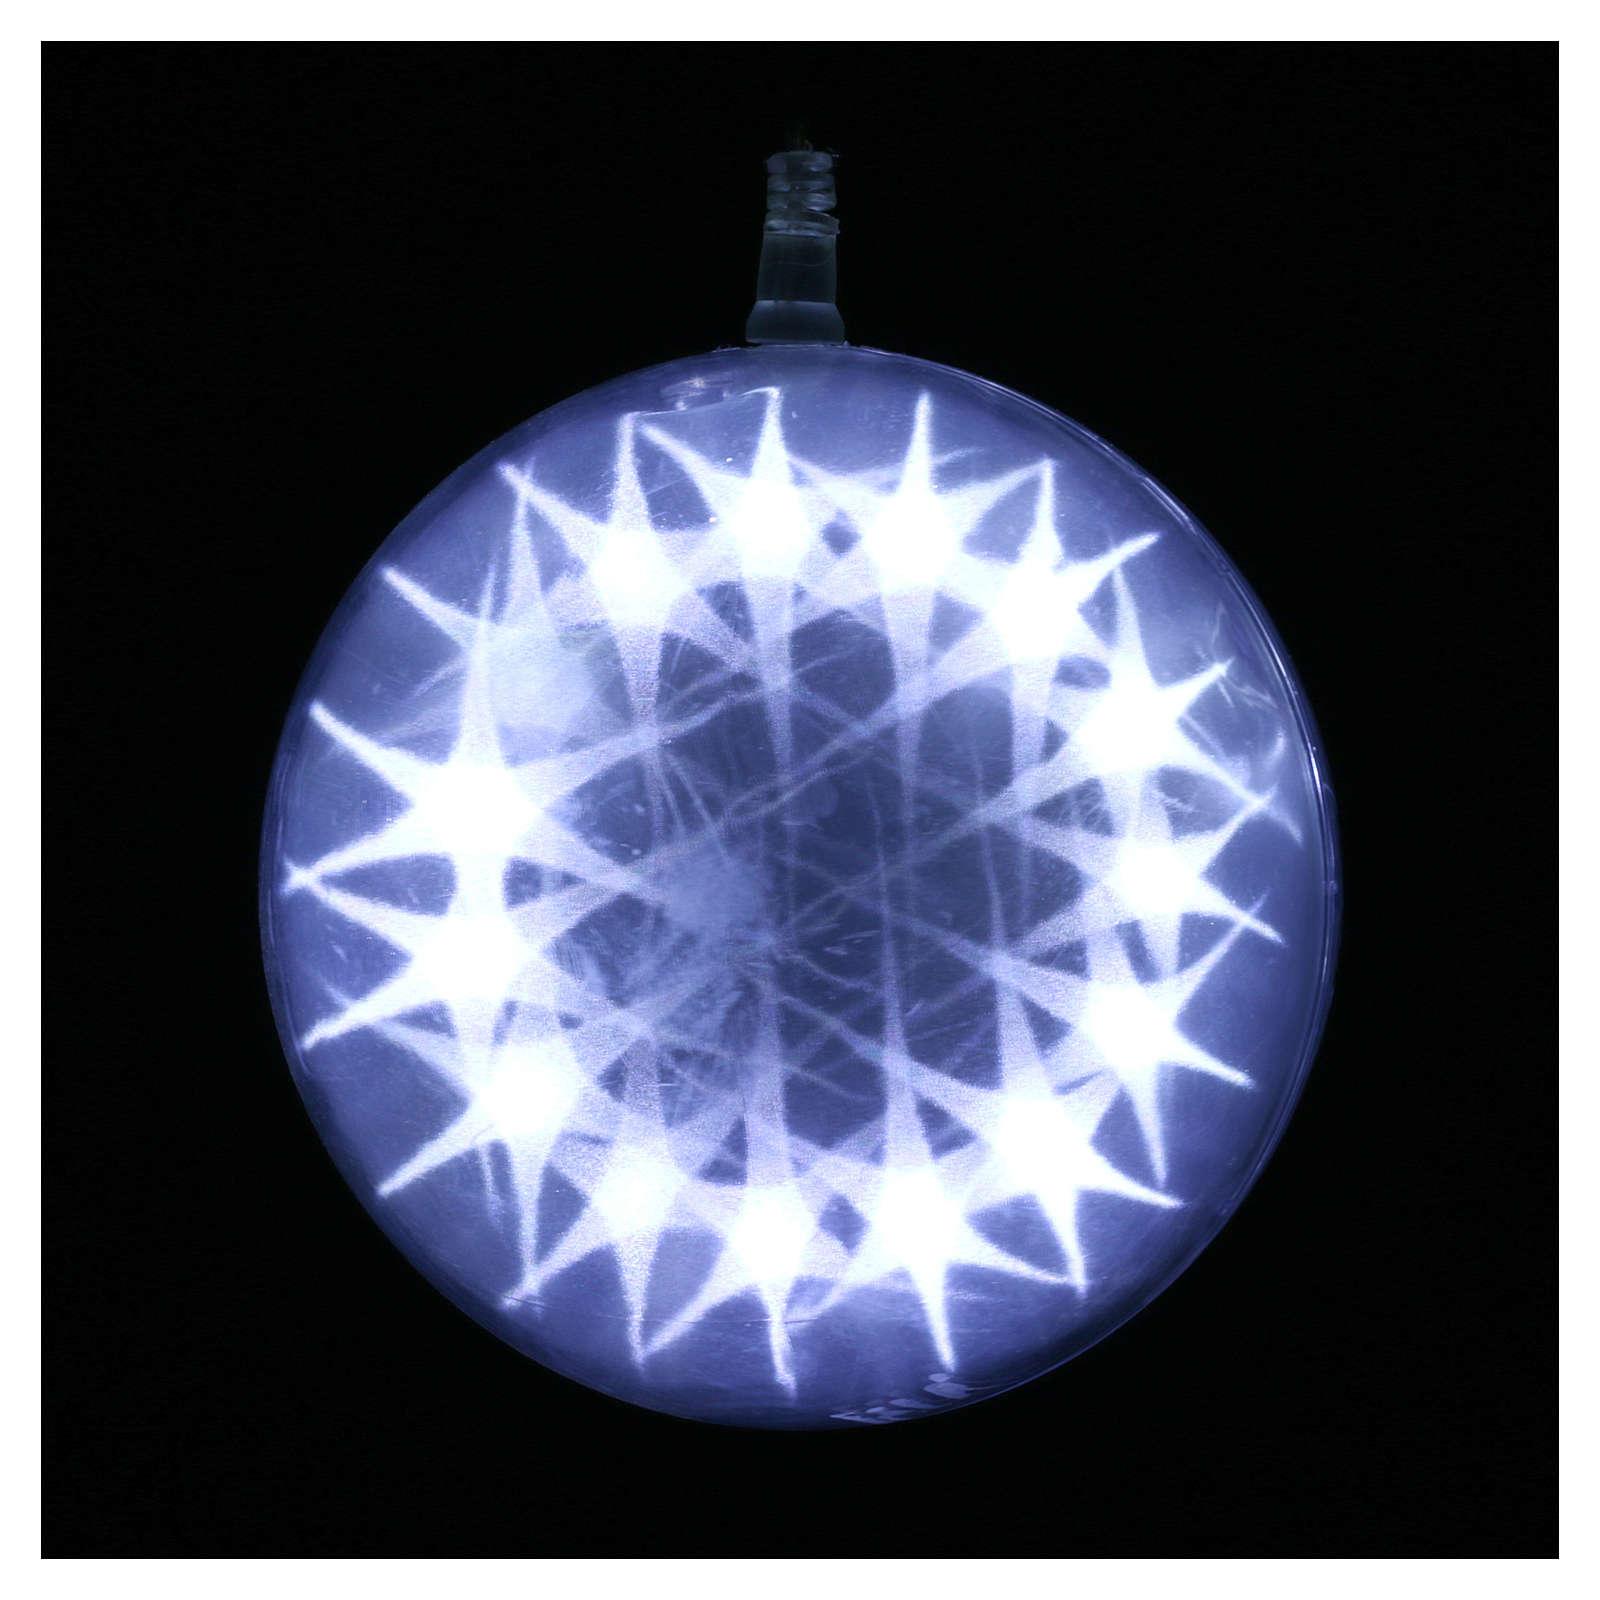 Illuminated sphere with light games 15 cm diameter ice white 3